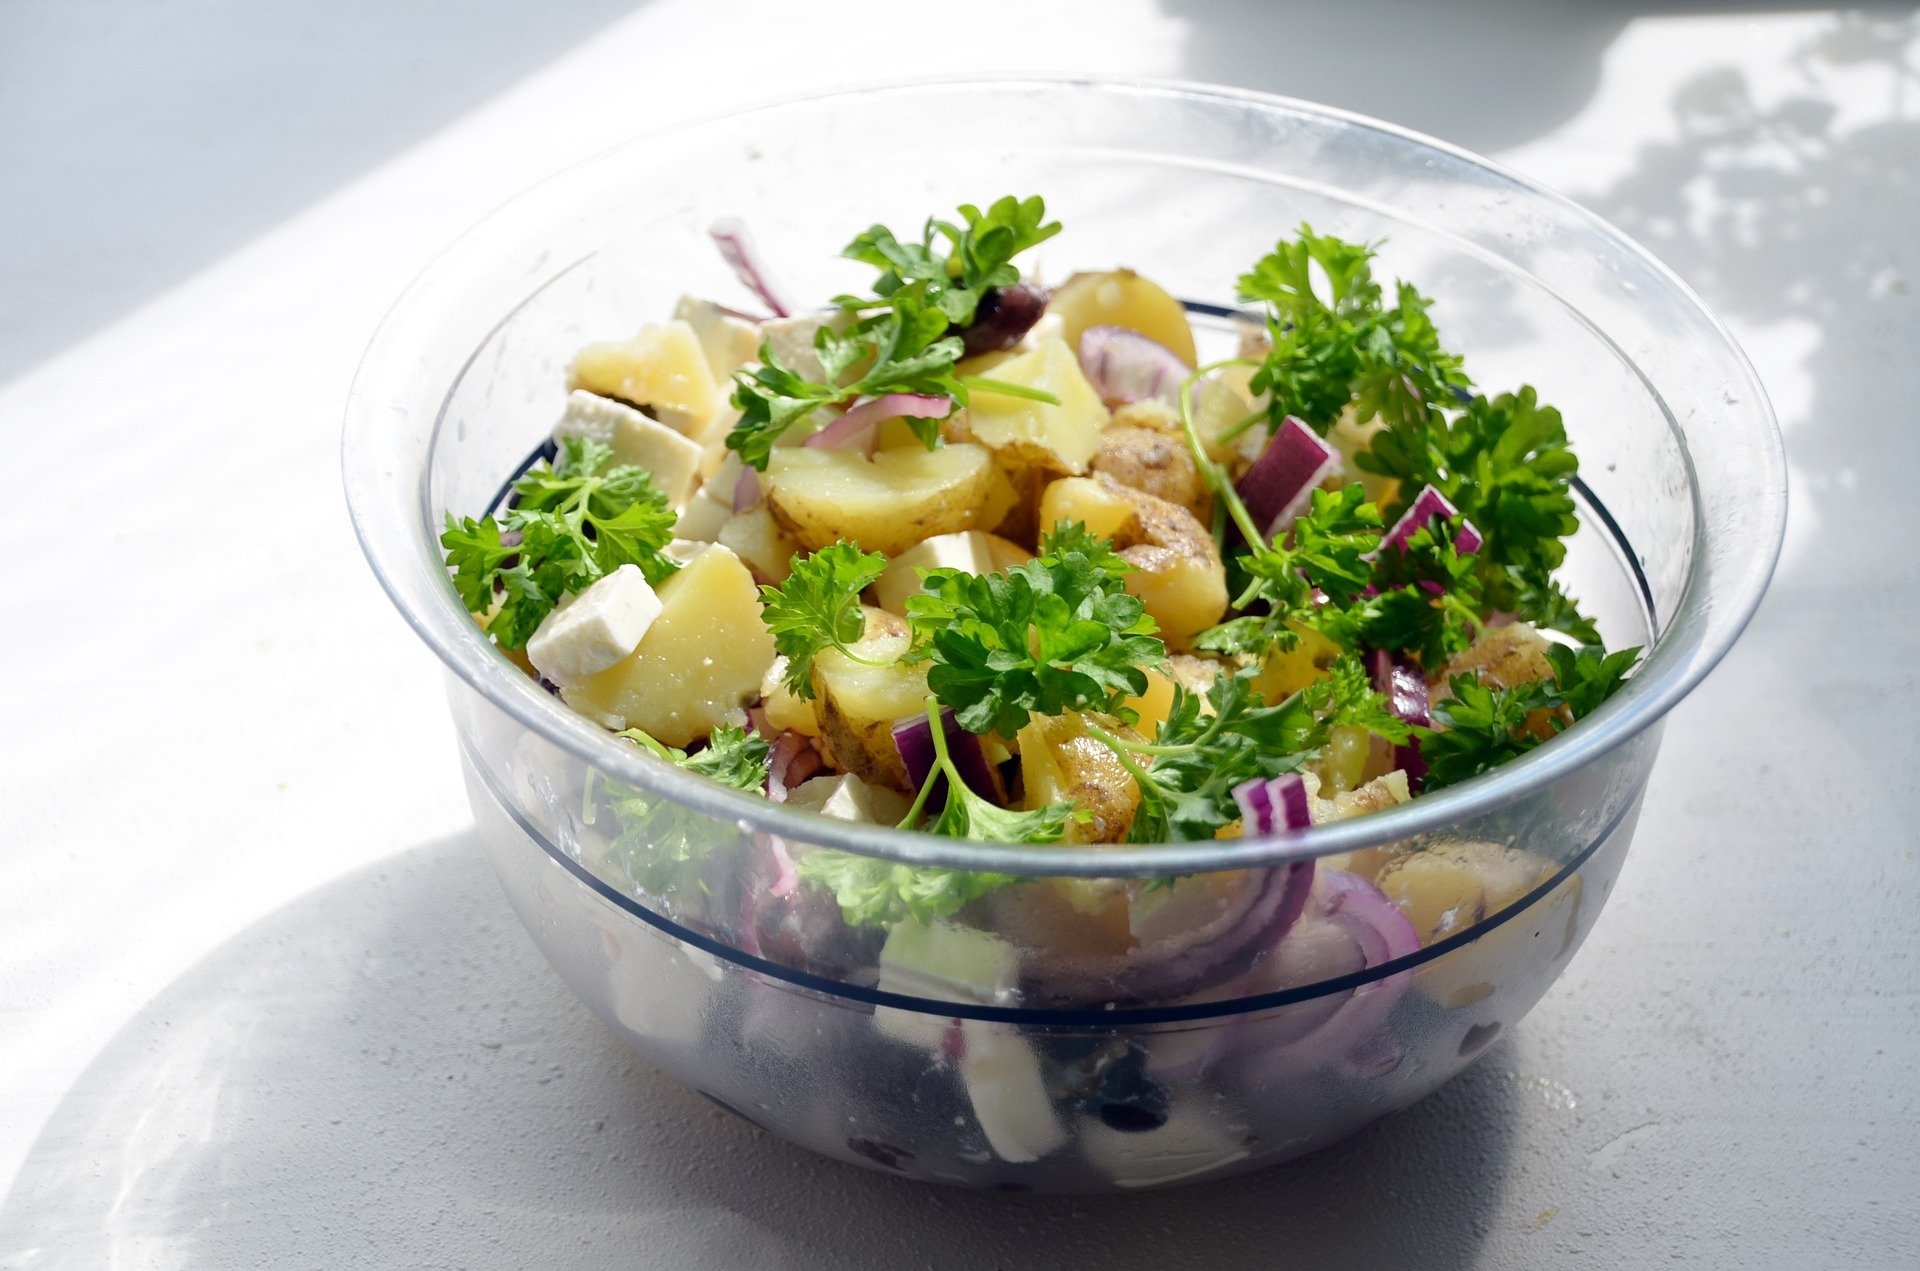 cold potato resistant starch